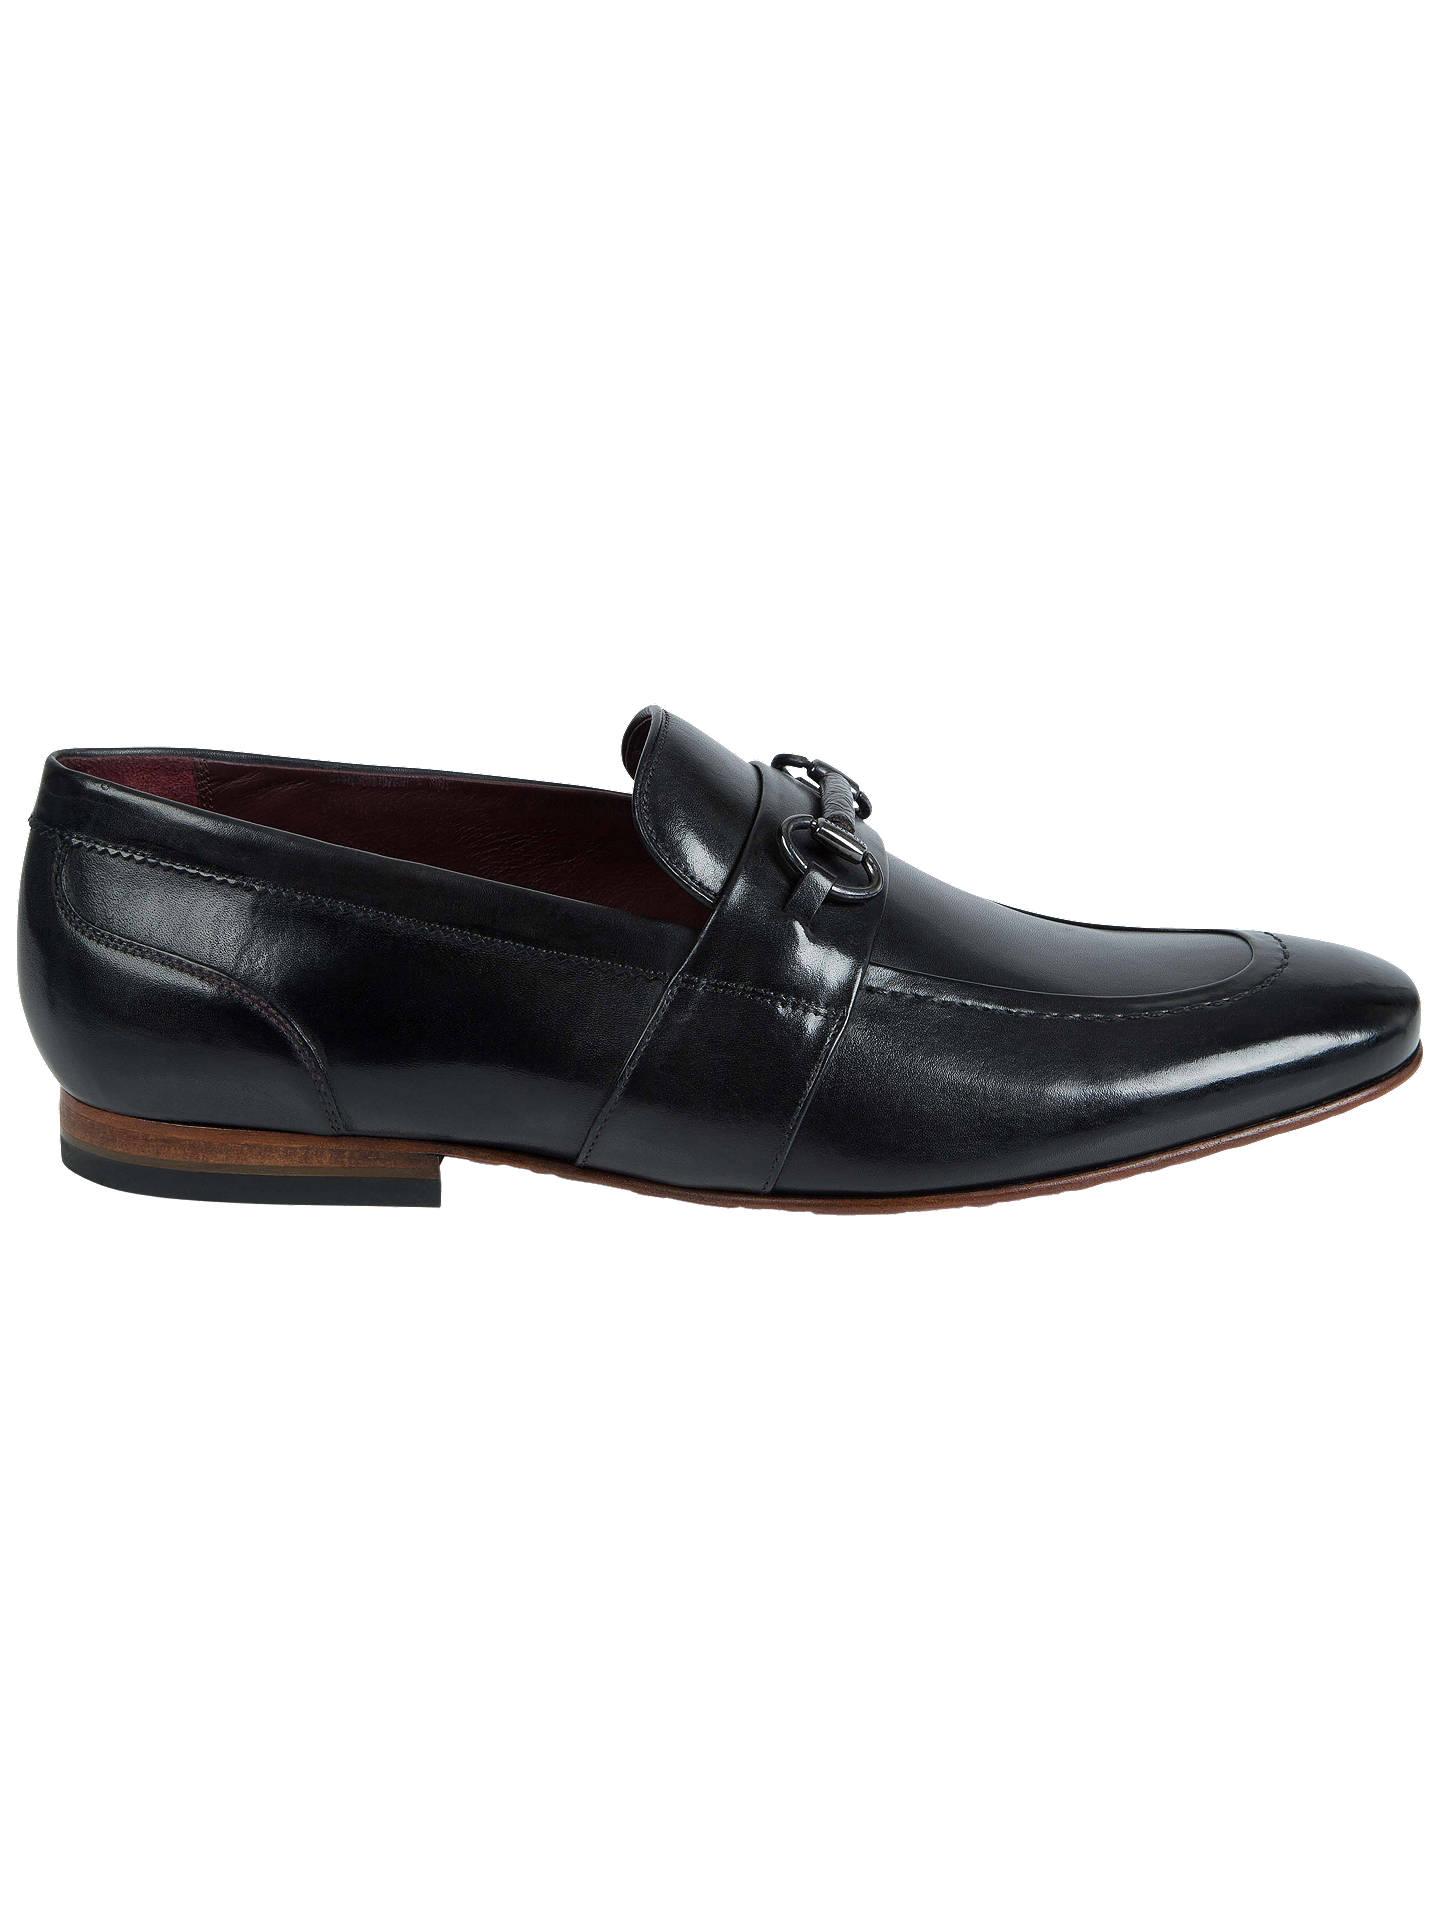 e1620903de4bd Buy Ted Baker Daiser Loafers